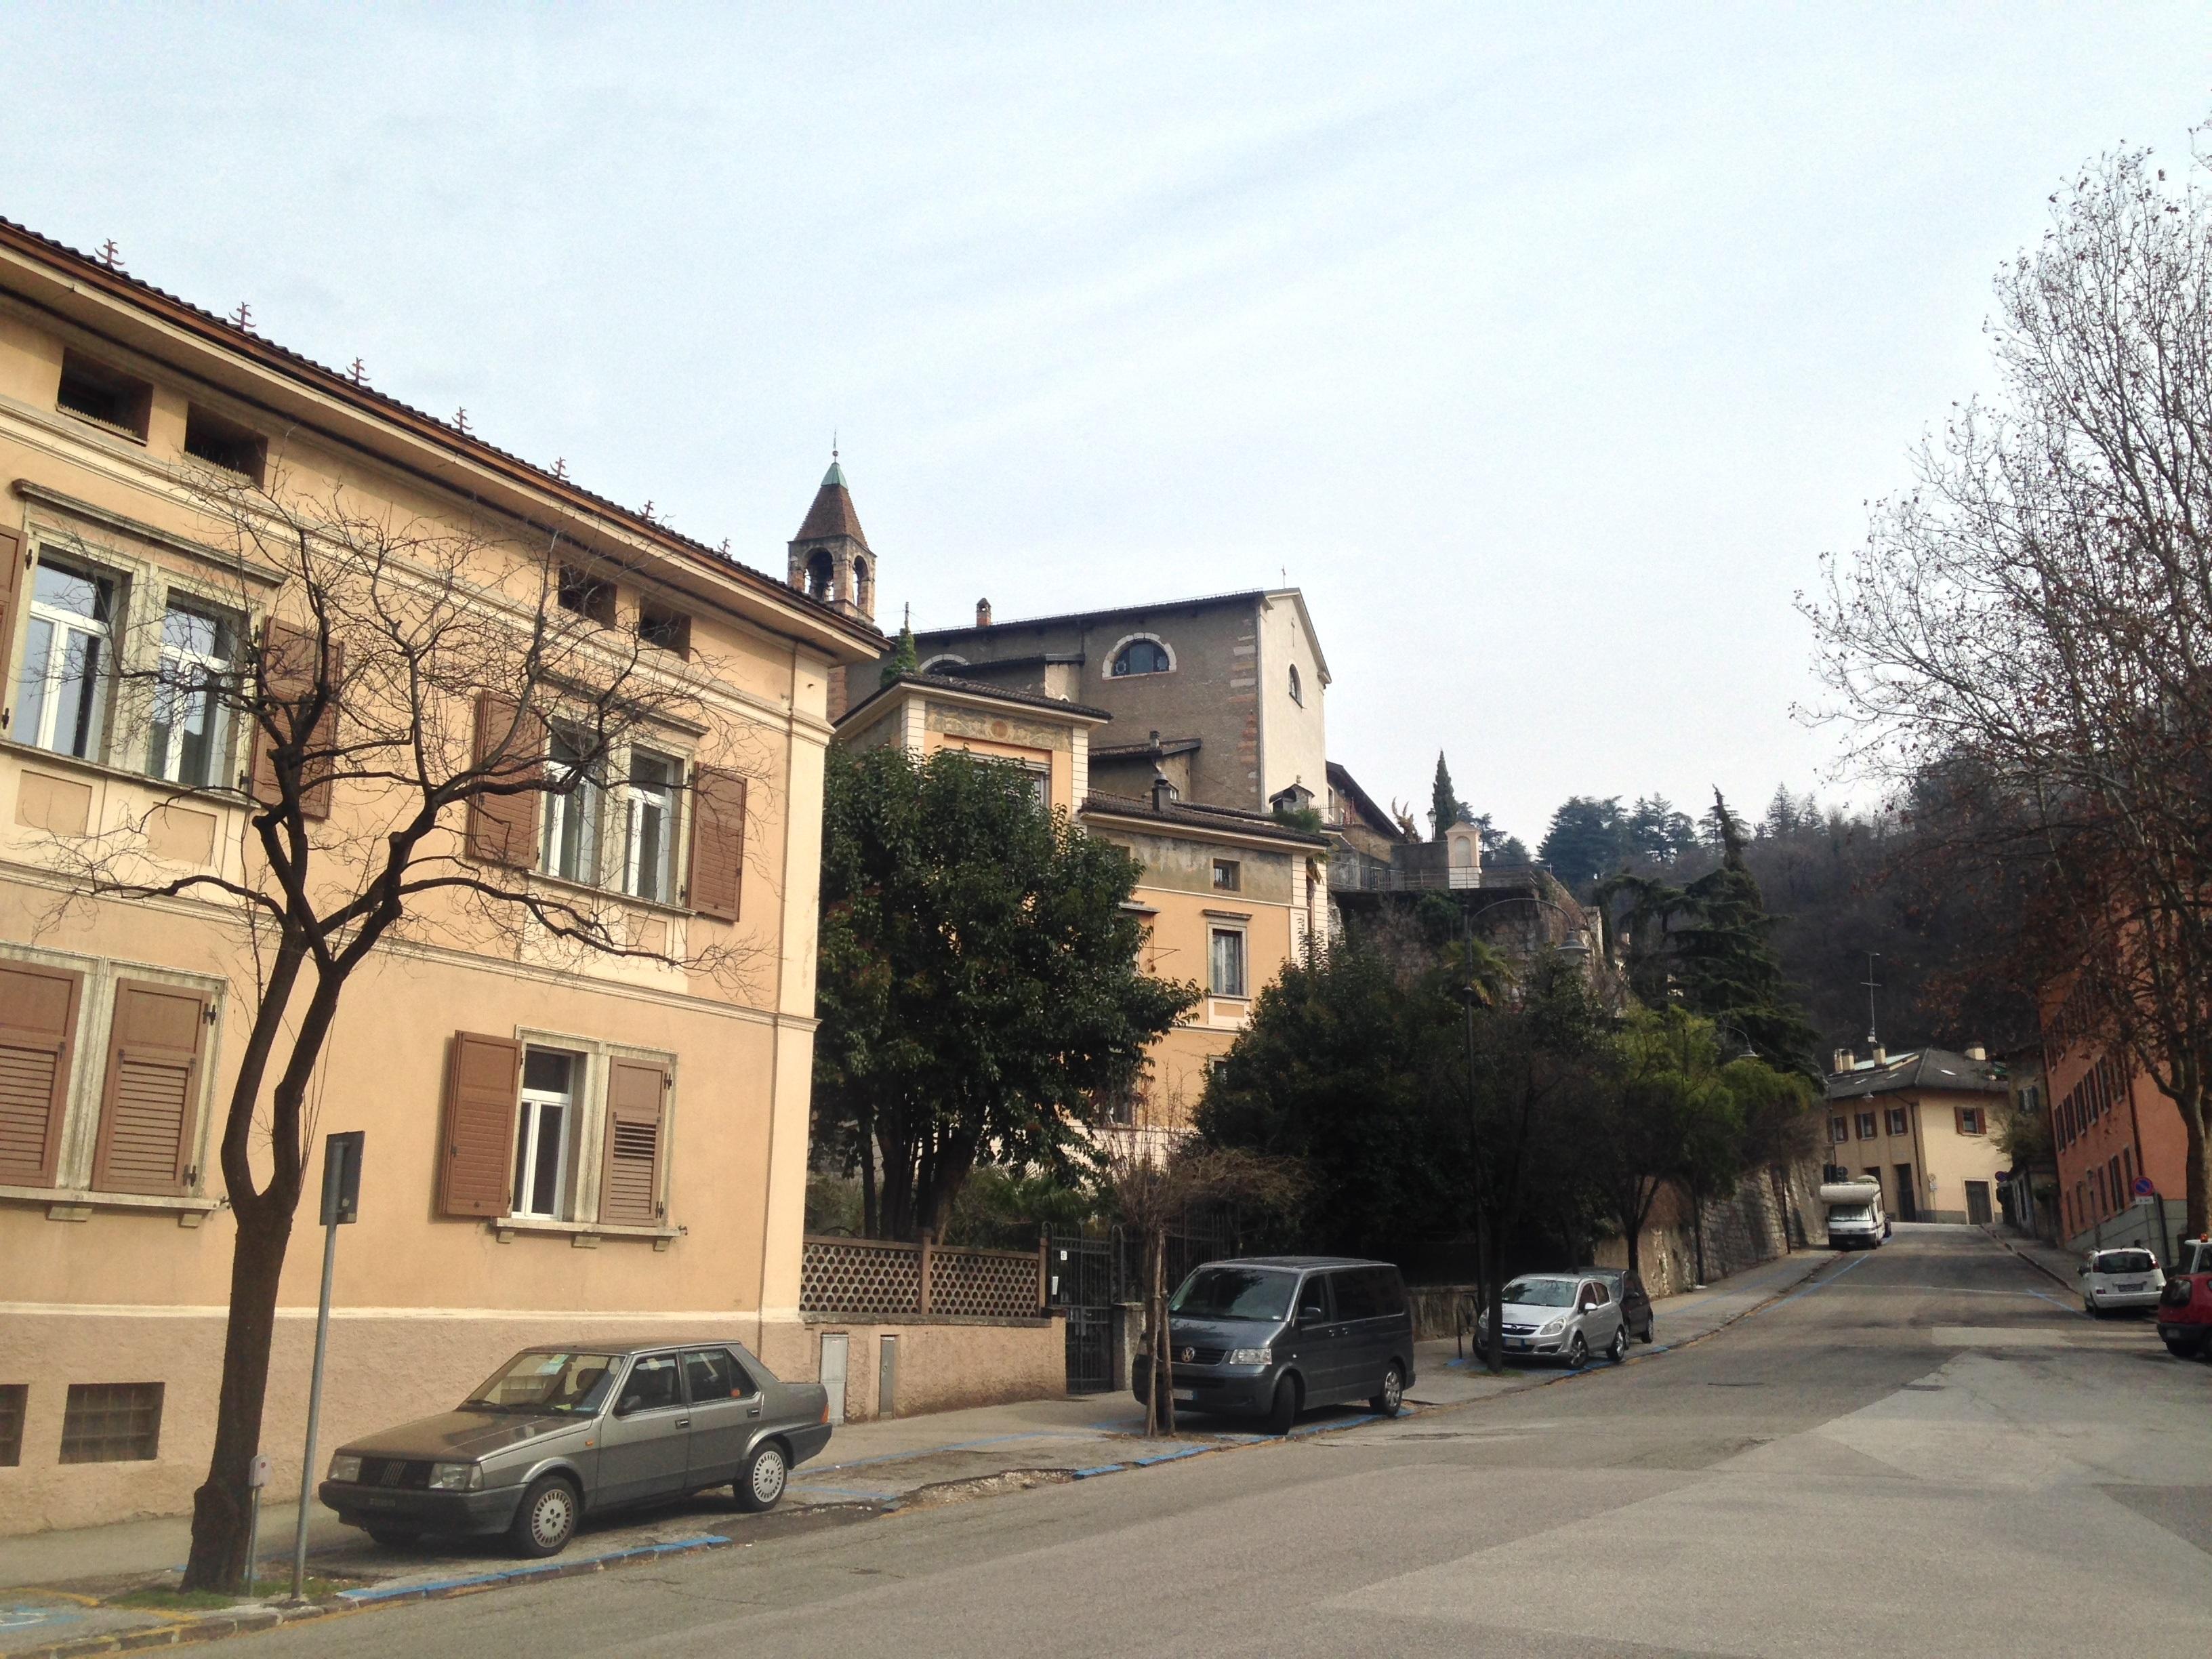 Convento S. Bernardino Trento